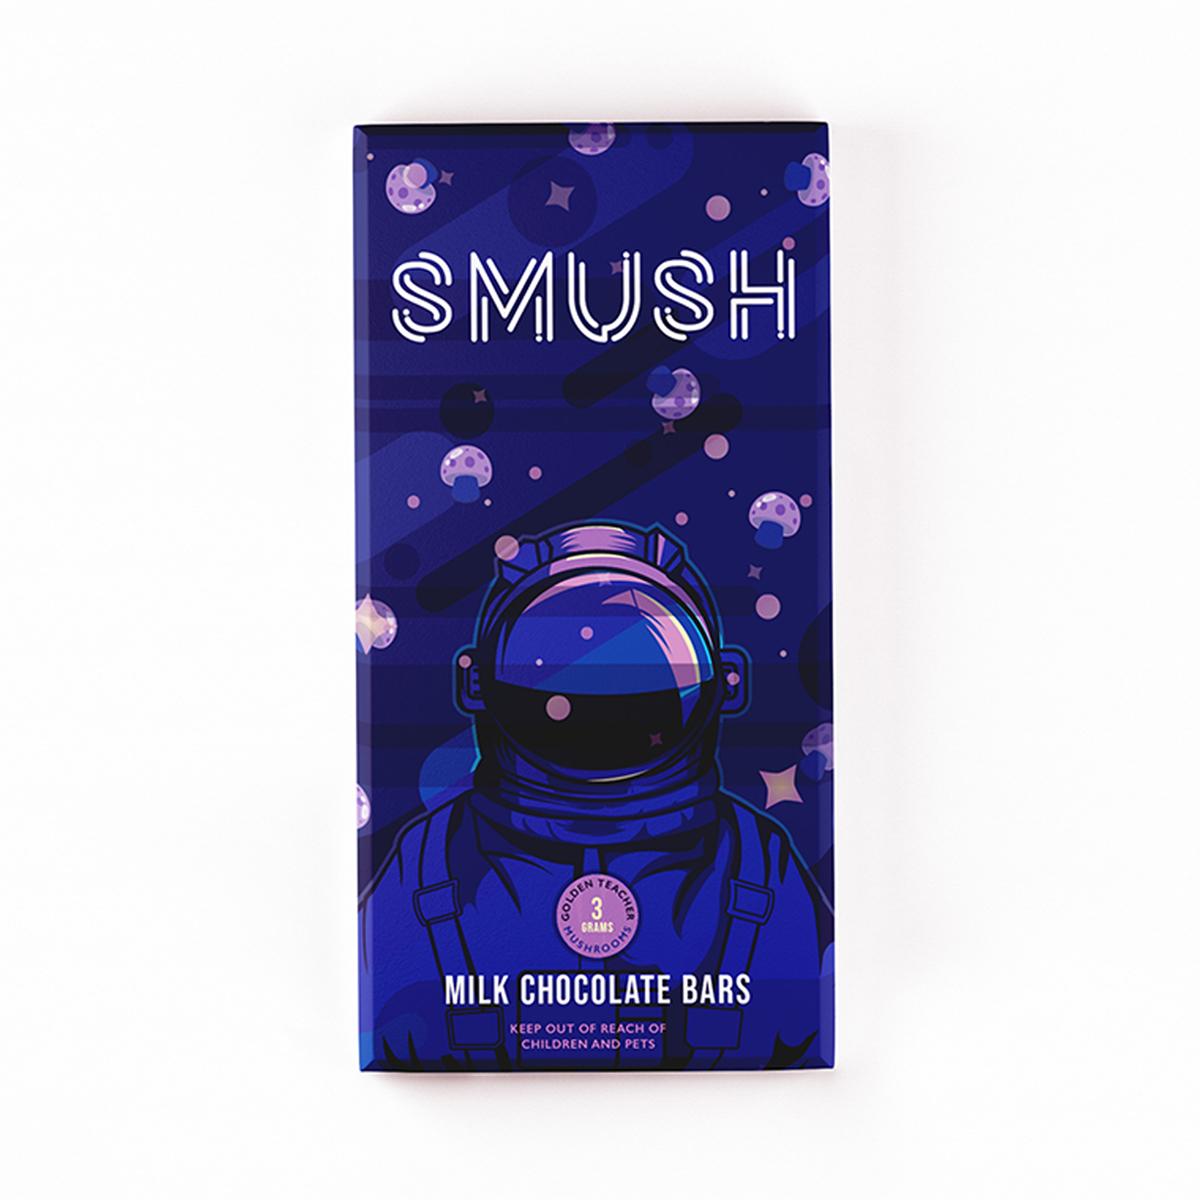 Buy Smush Milk Chocolate Bars - 3grams